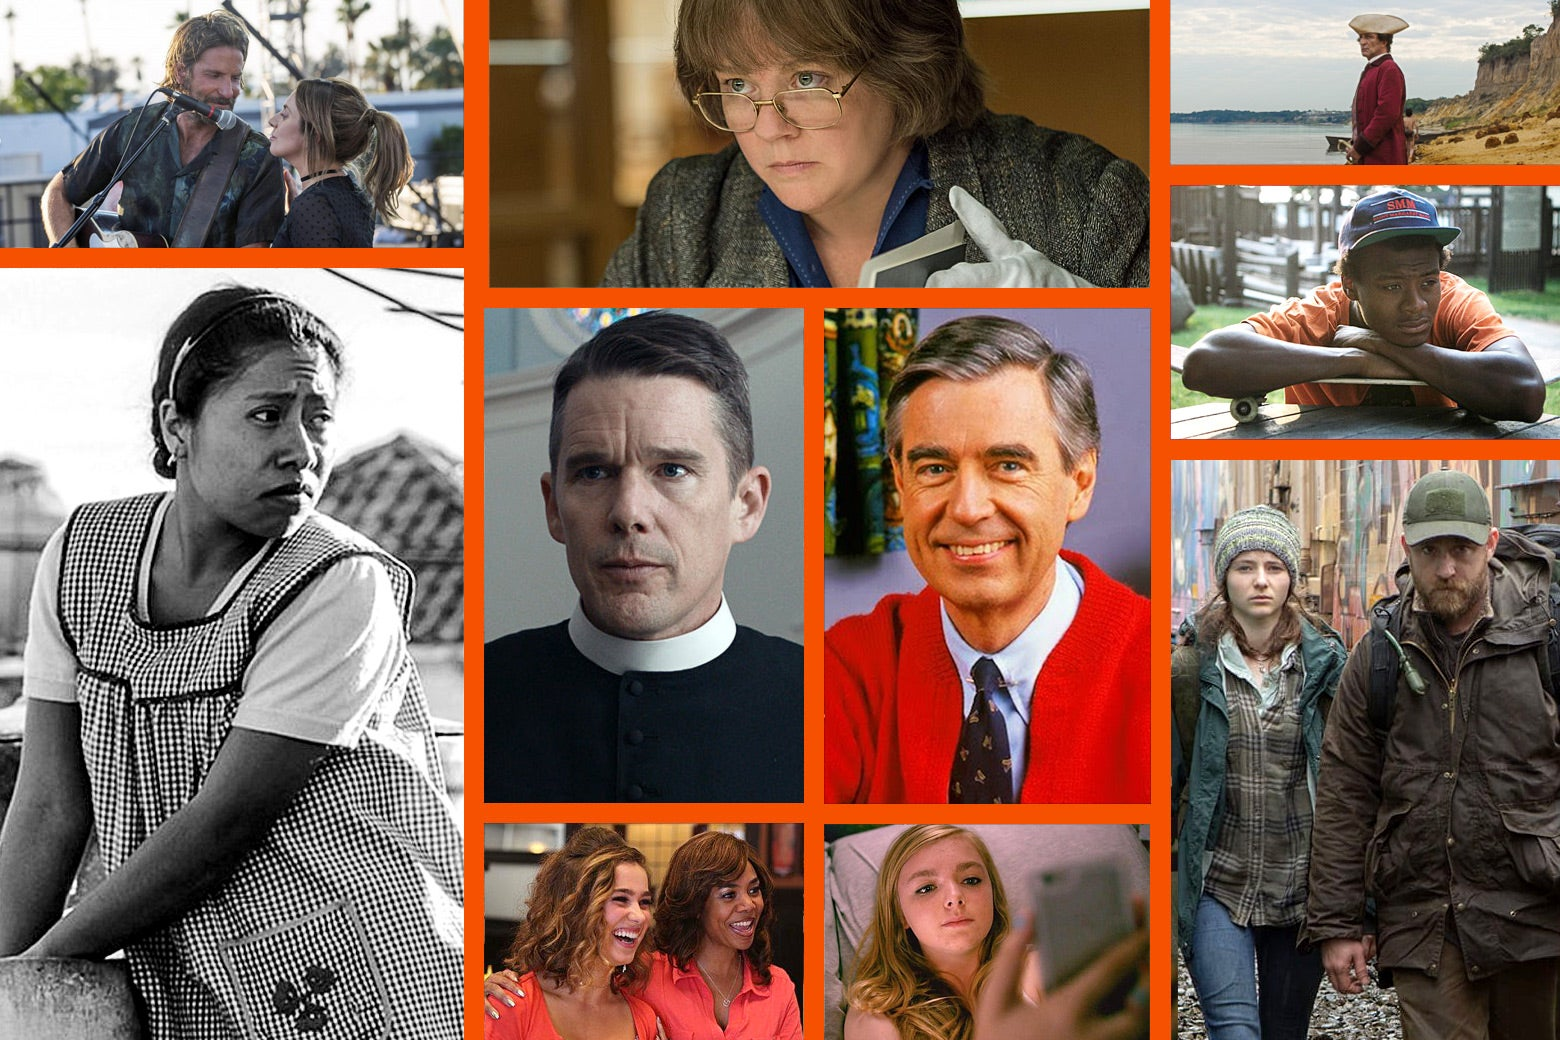 Collage of movie scenes